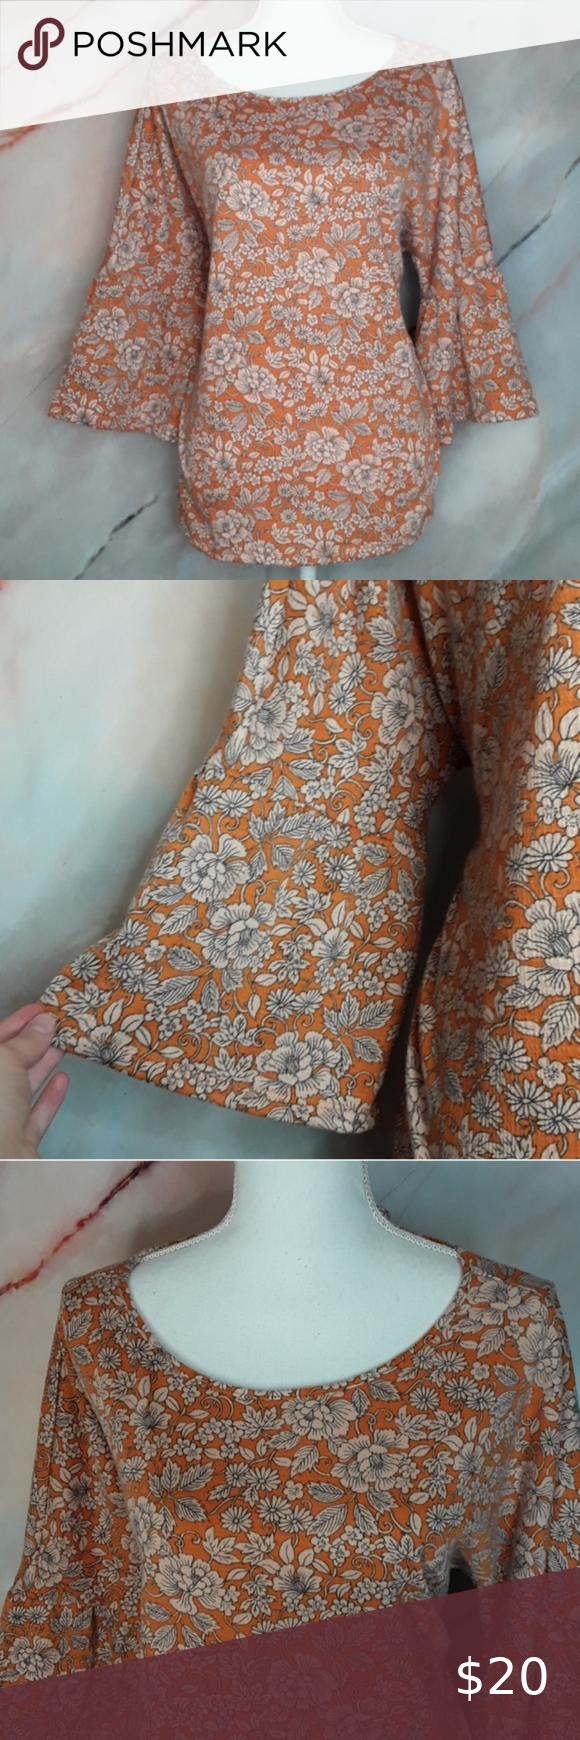 LC Lauren Conrad Metallic Sheer Top | Clothes design